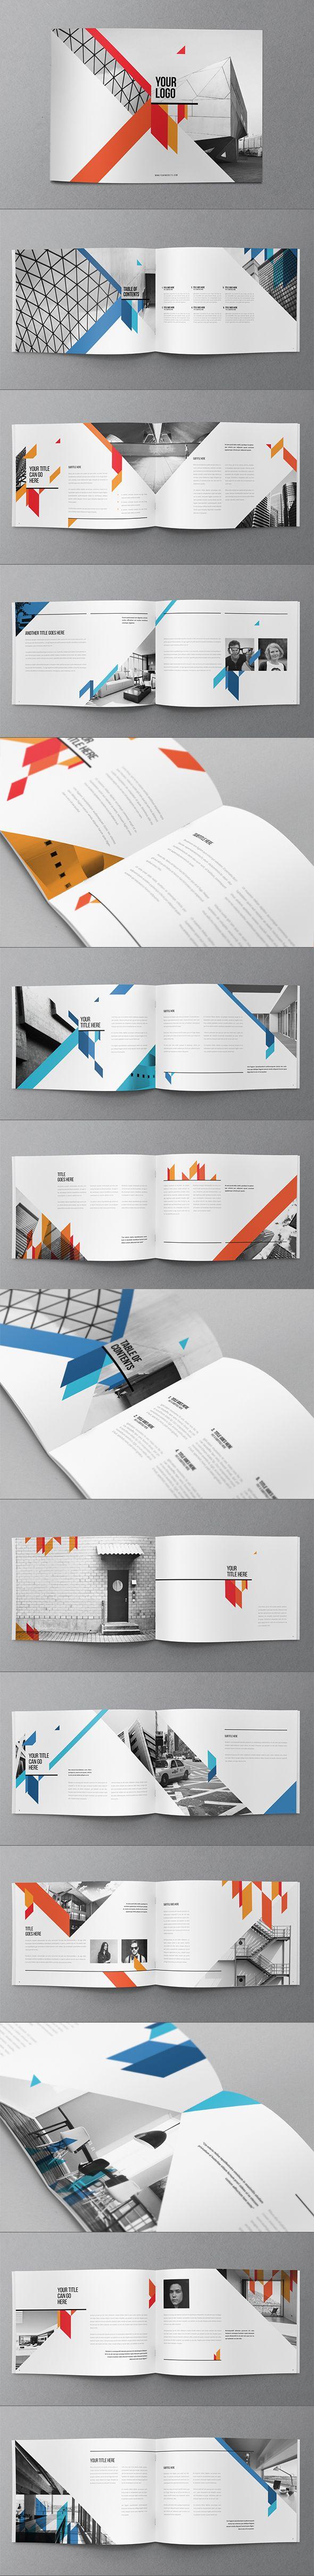 Clean Modern Red Blue Brochure. Download here: http://graphicriver.net/item/clean-modern-red-blue-brochure/10410539?ref=abradesign #design #brochure